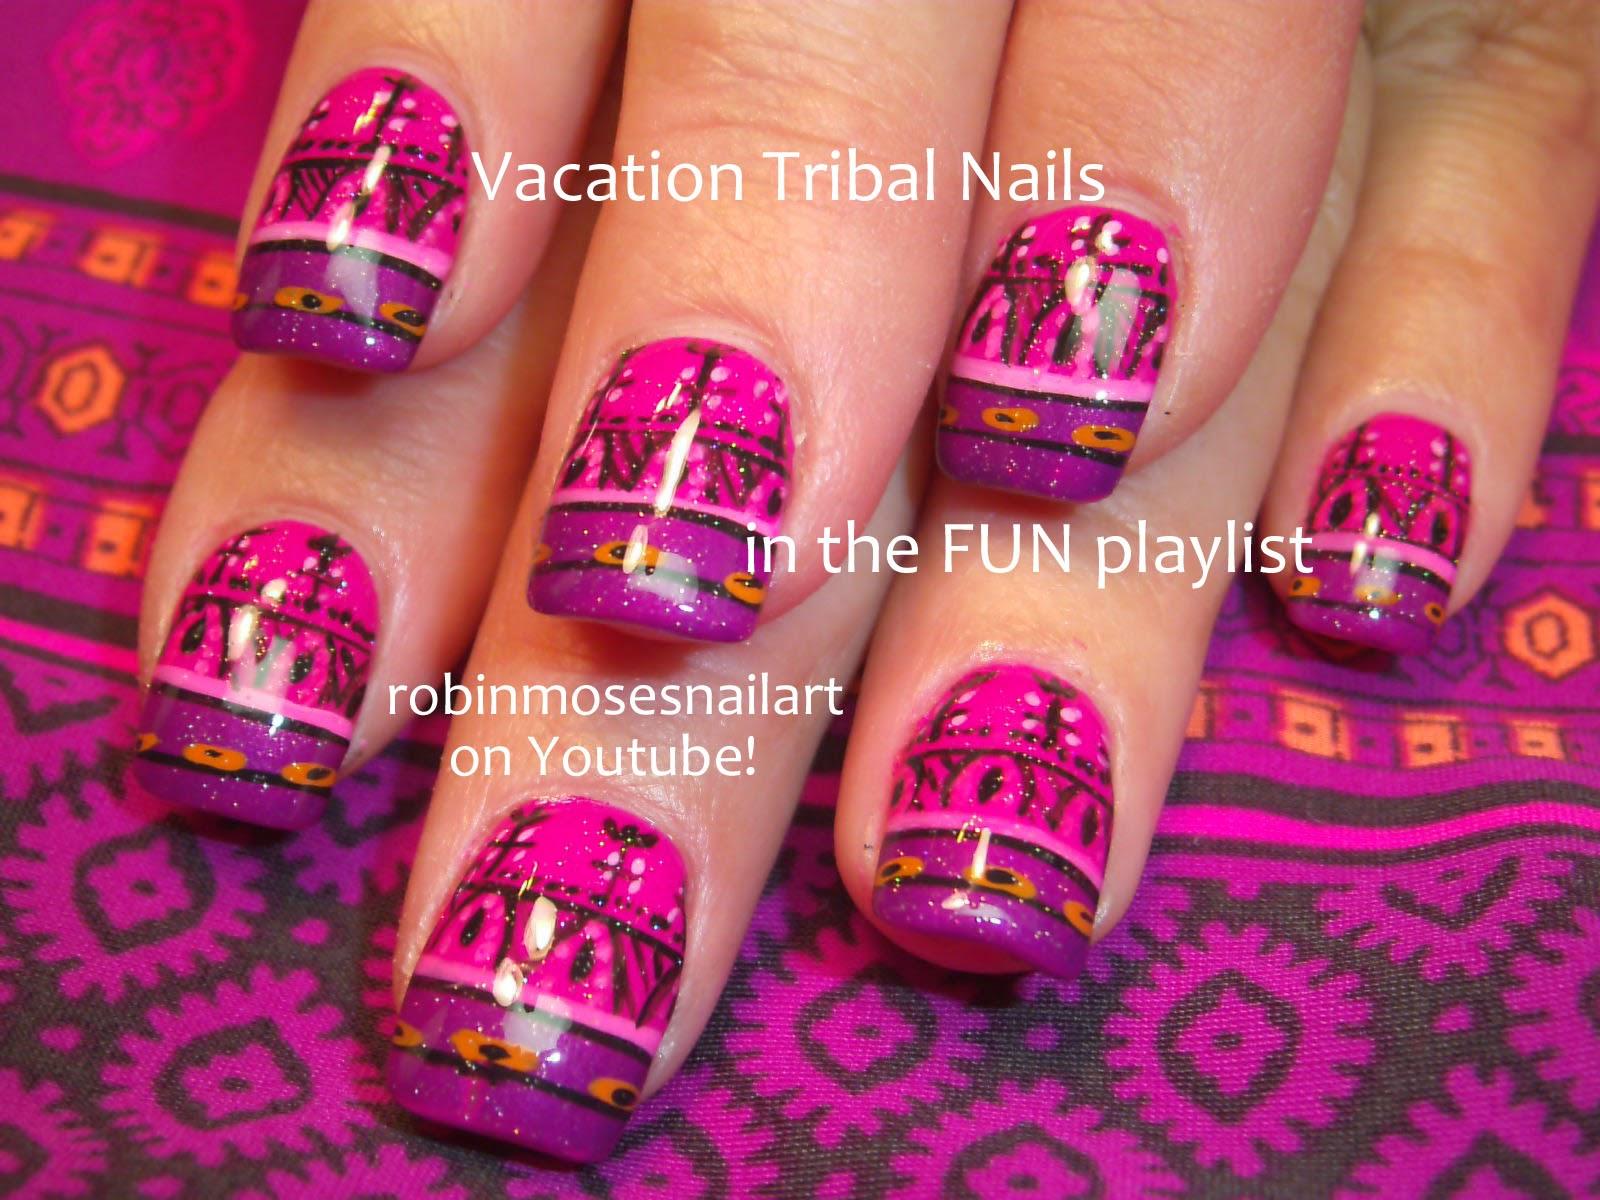 Nail art by robin moses may 2015 cute nail art playlist diy easy nail tutorials cute nail designs nail art for beginners to advanced nail techs solutioingenieria Choice Image